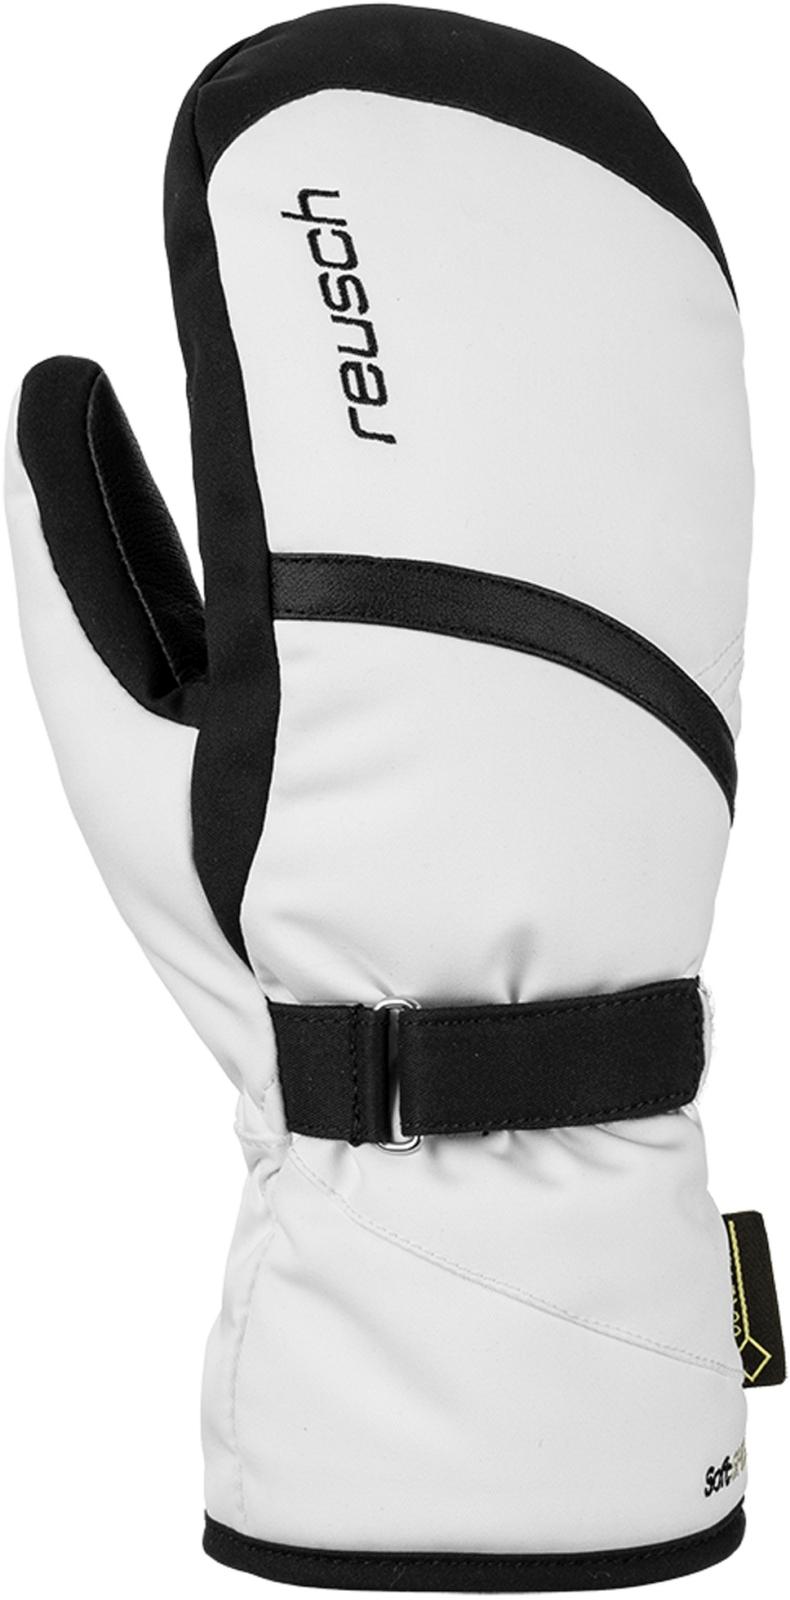 8c337ed7288 Dámské lyžařské palčáky Reusch Alexa GTX Mitten - white black - Ski ...